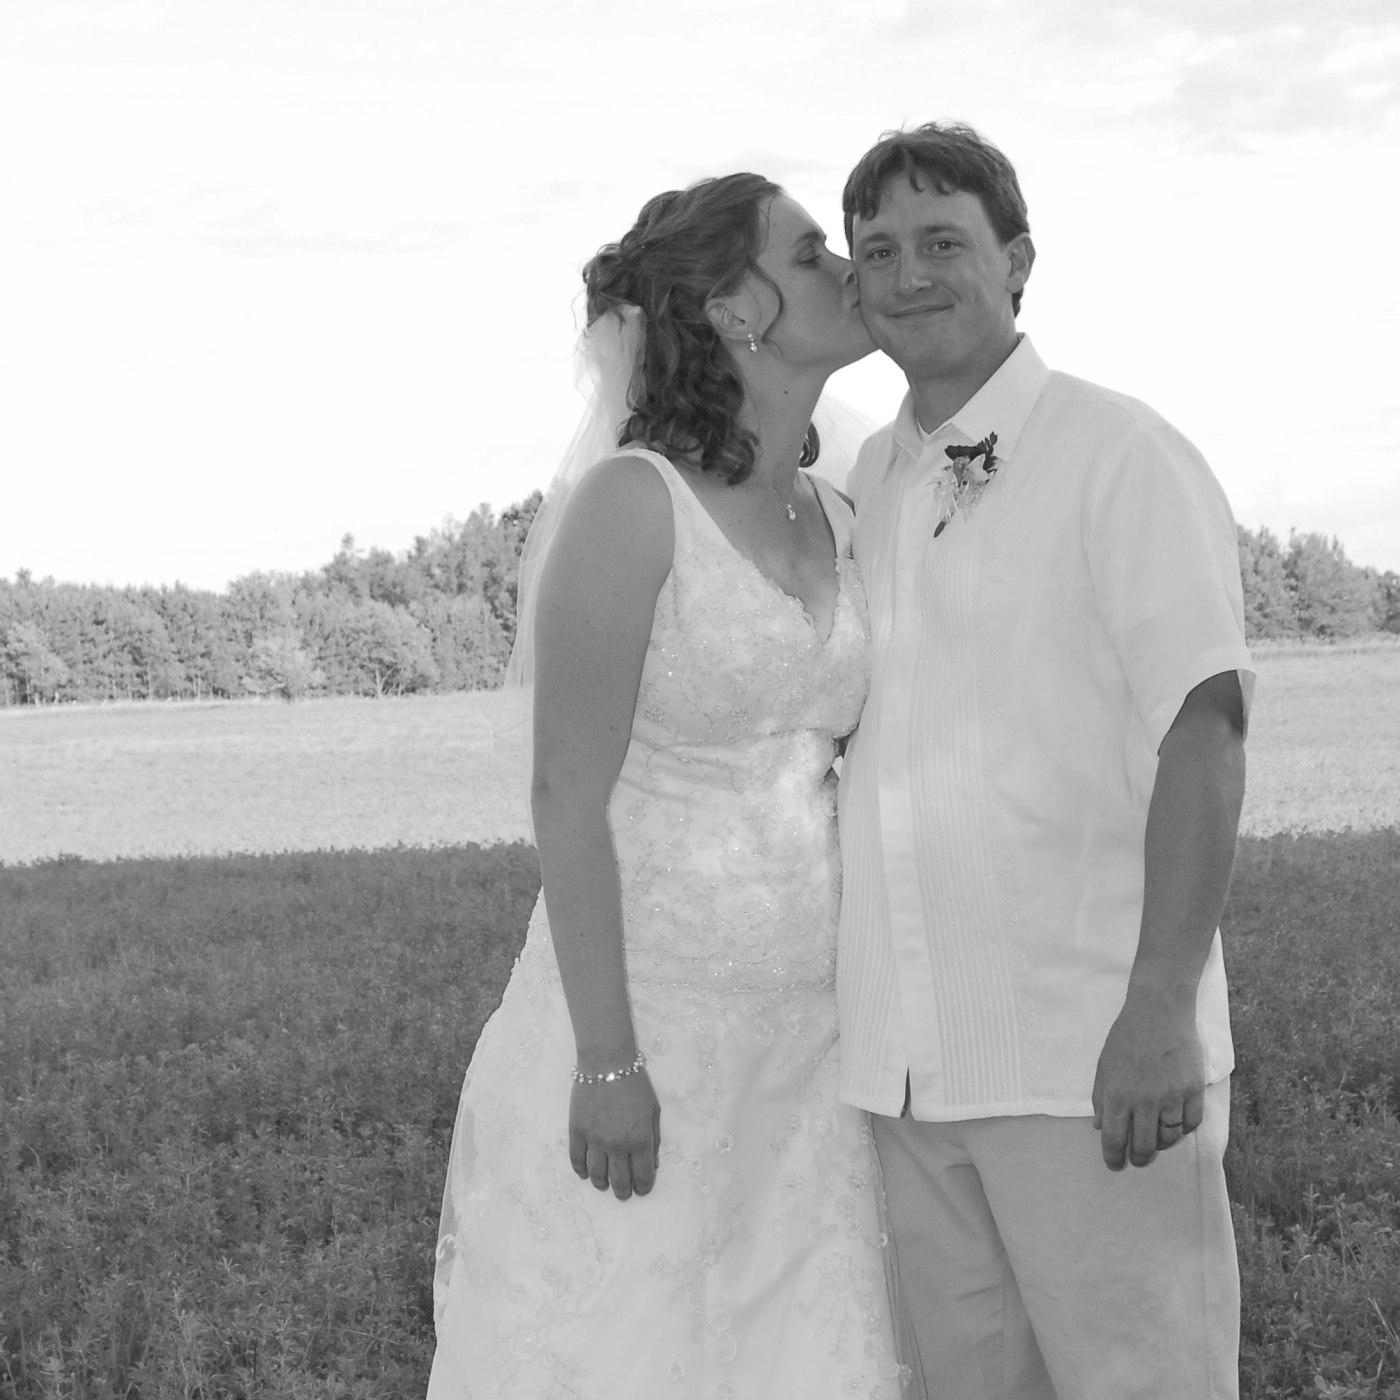 wedding photo at farm